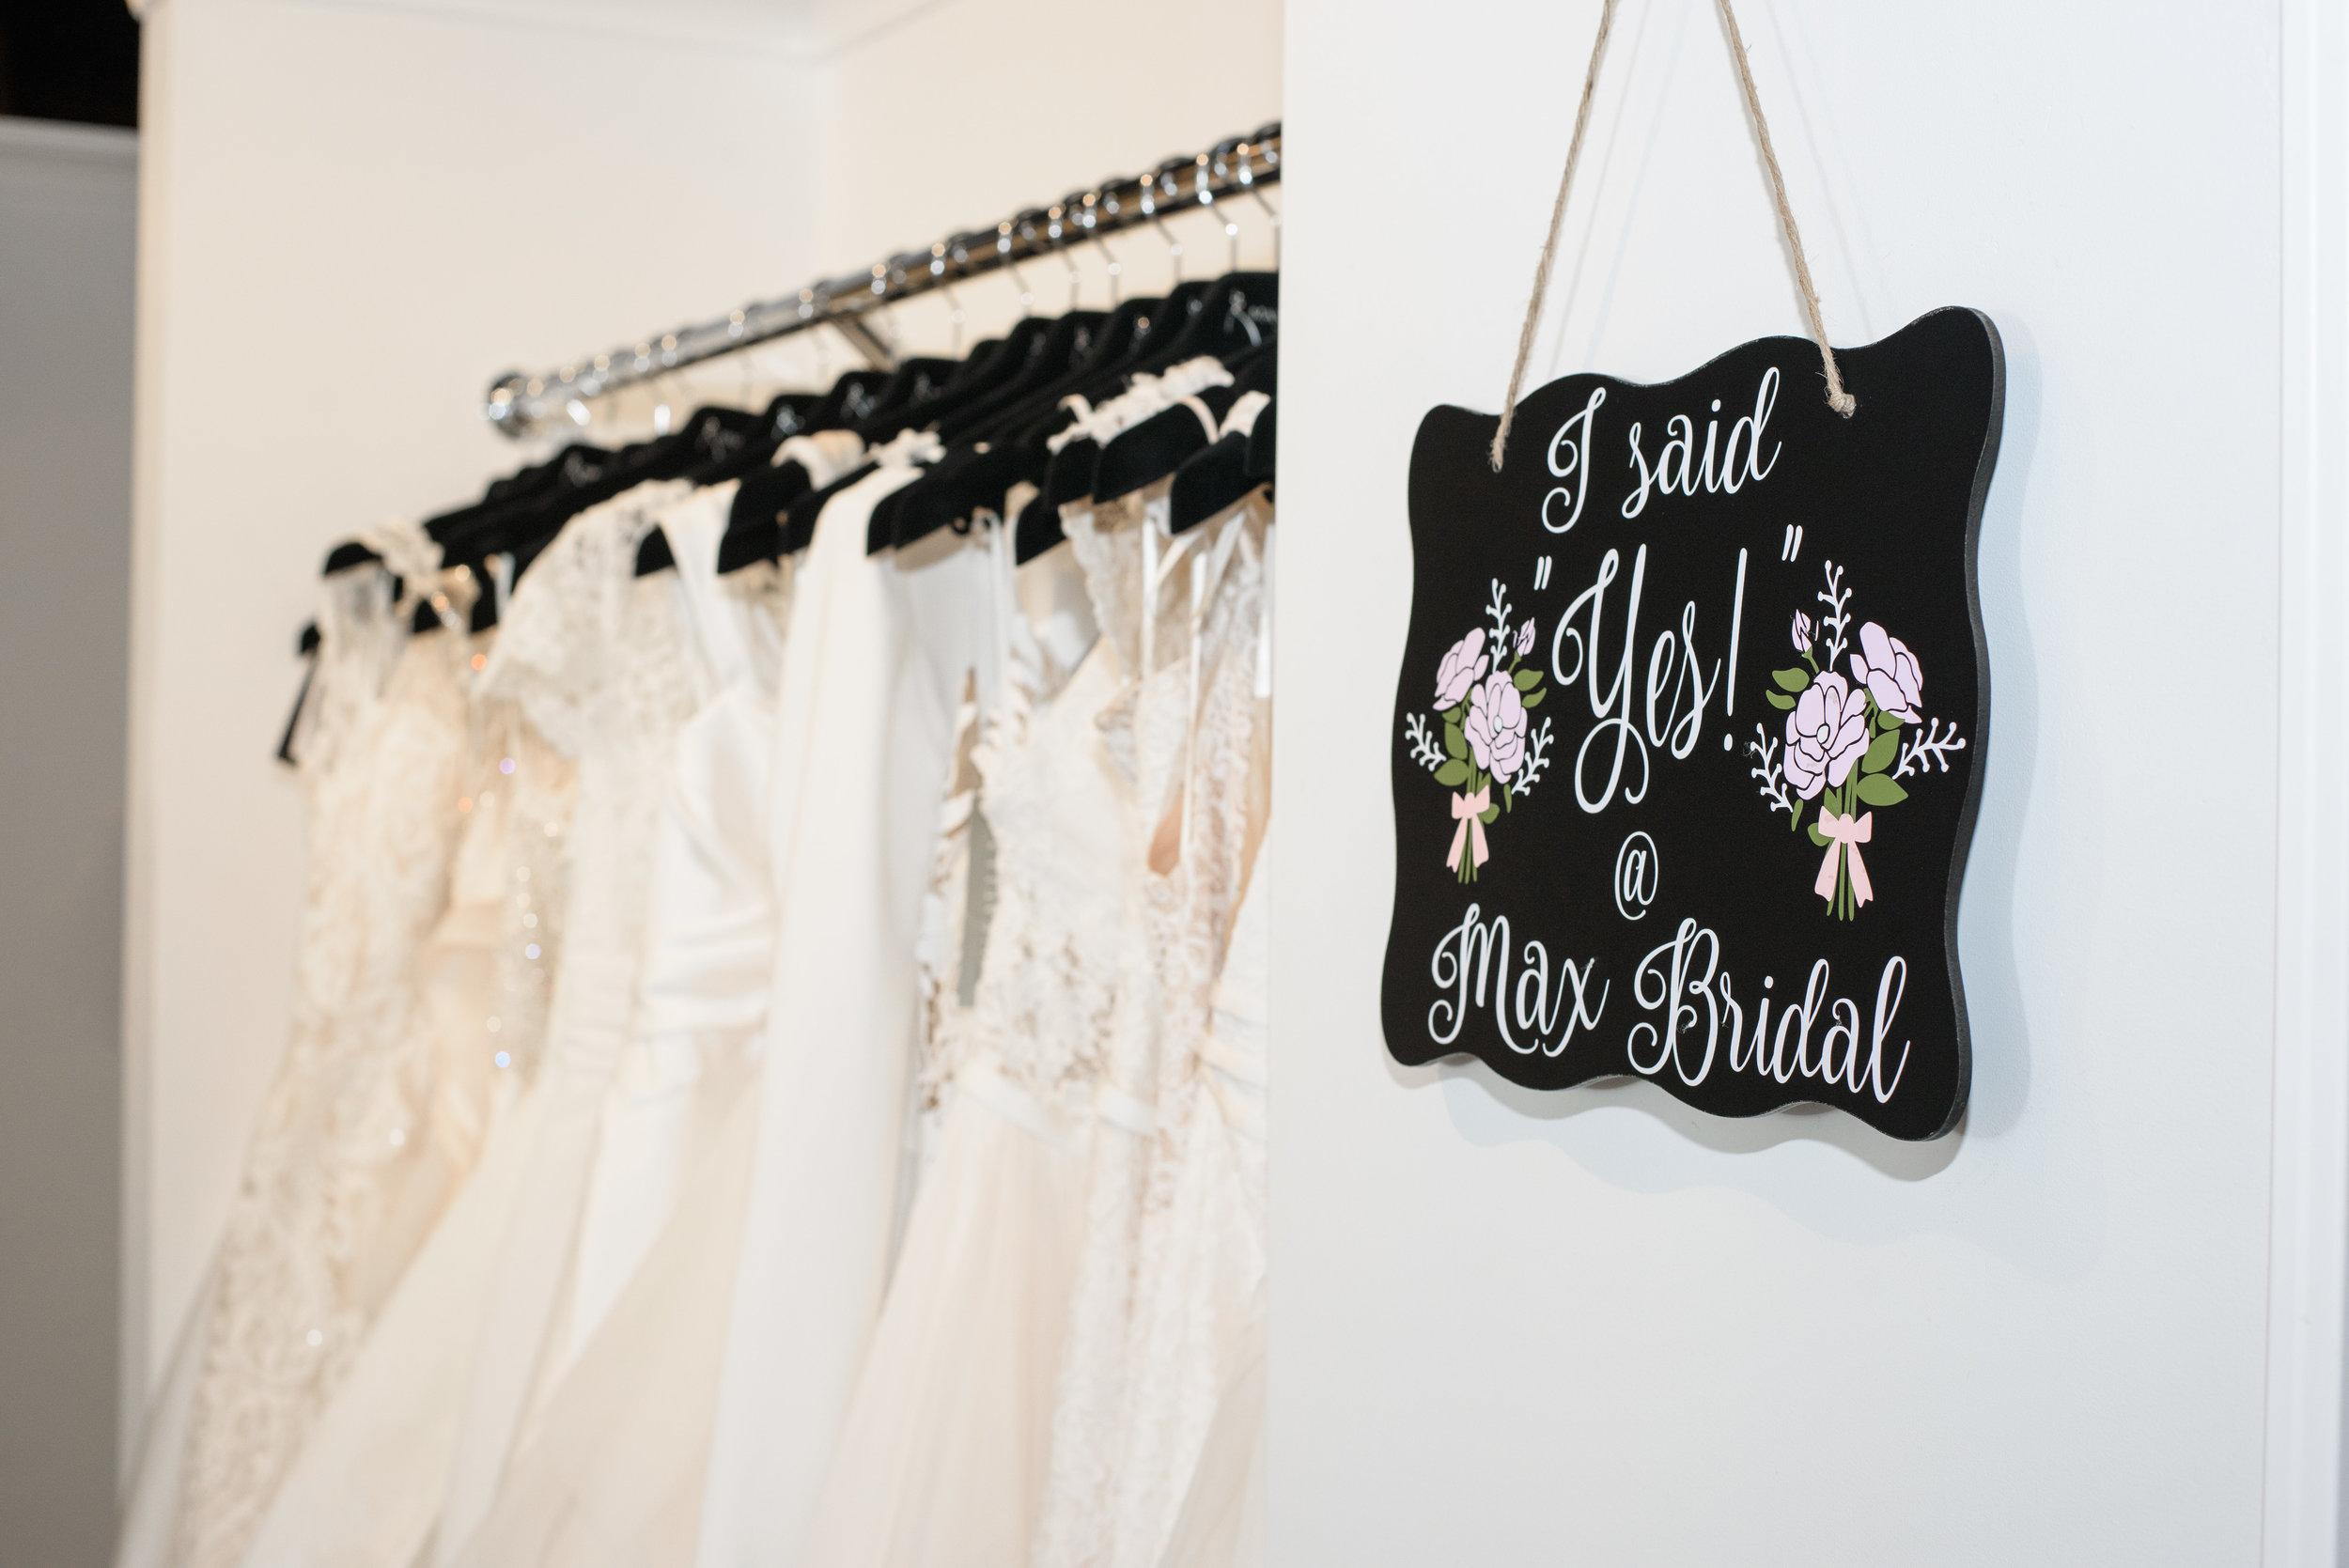 Max Bridal Photos By Lotus Weddings-33.jpg